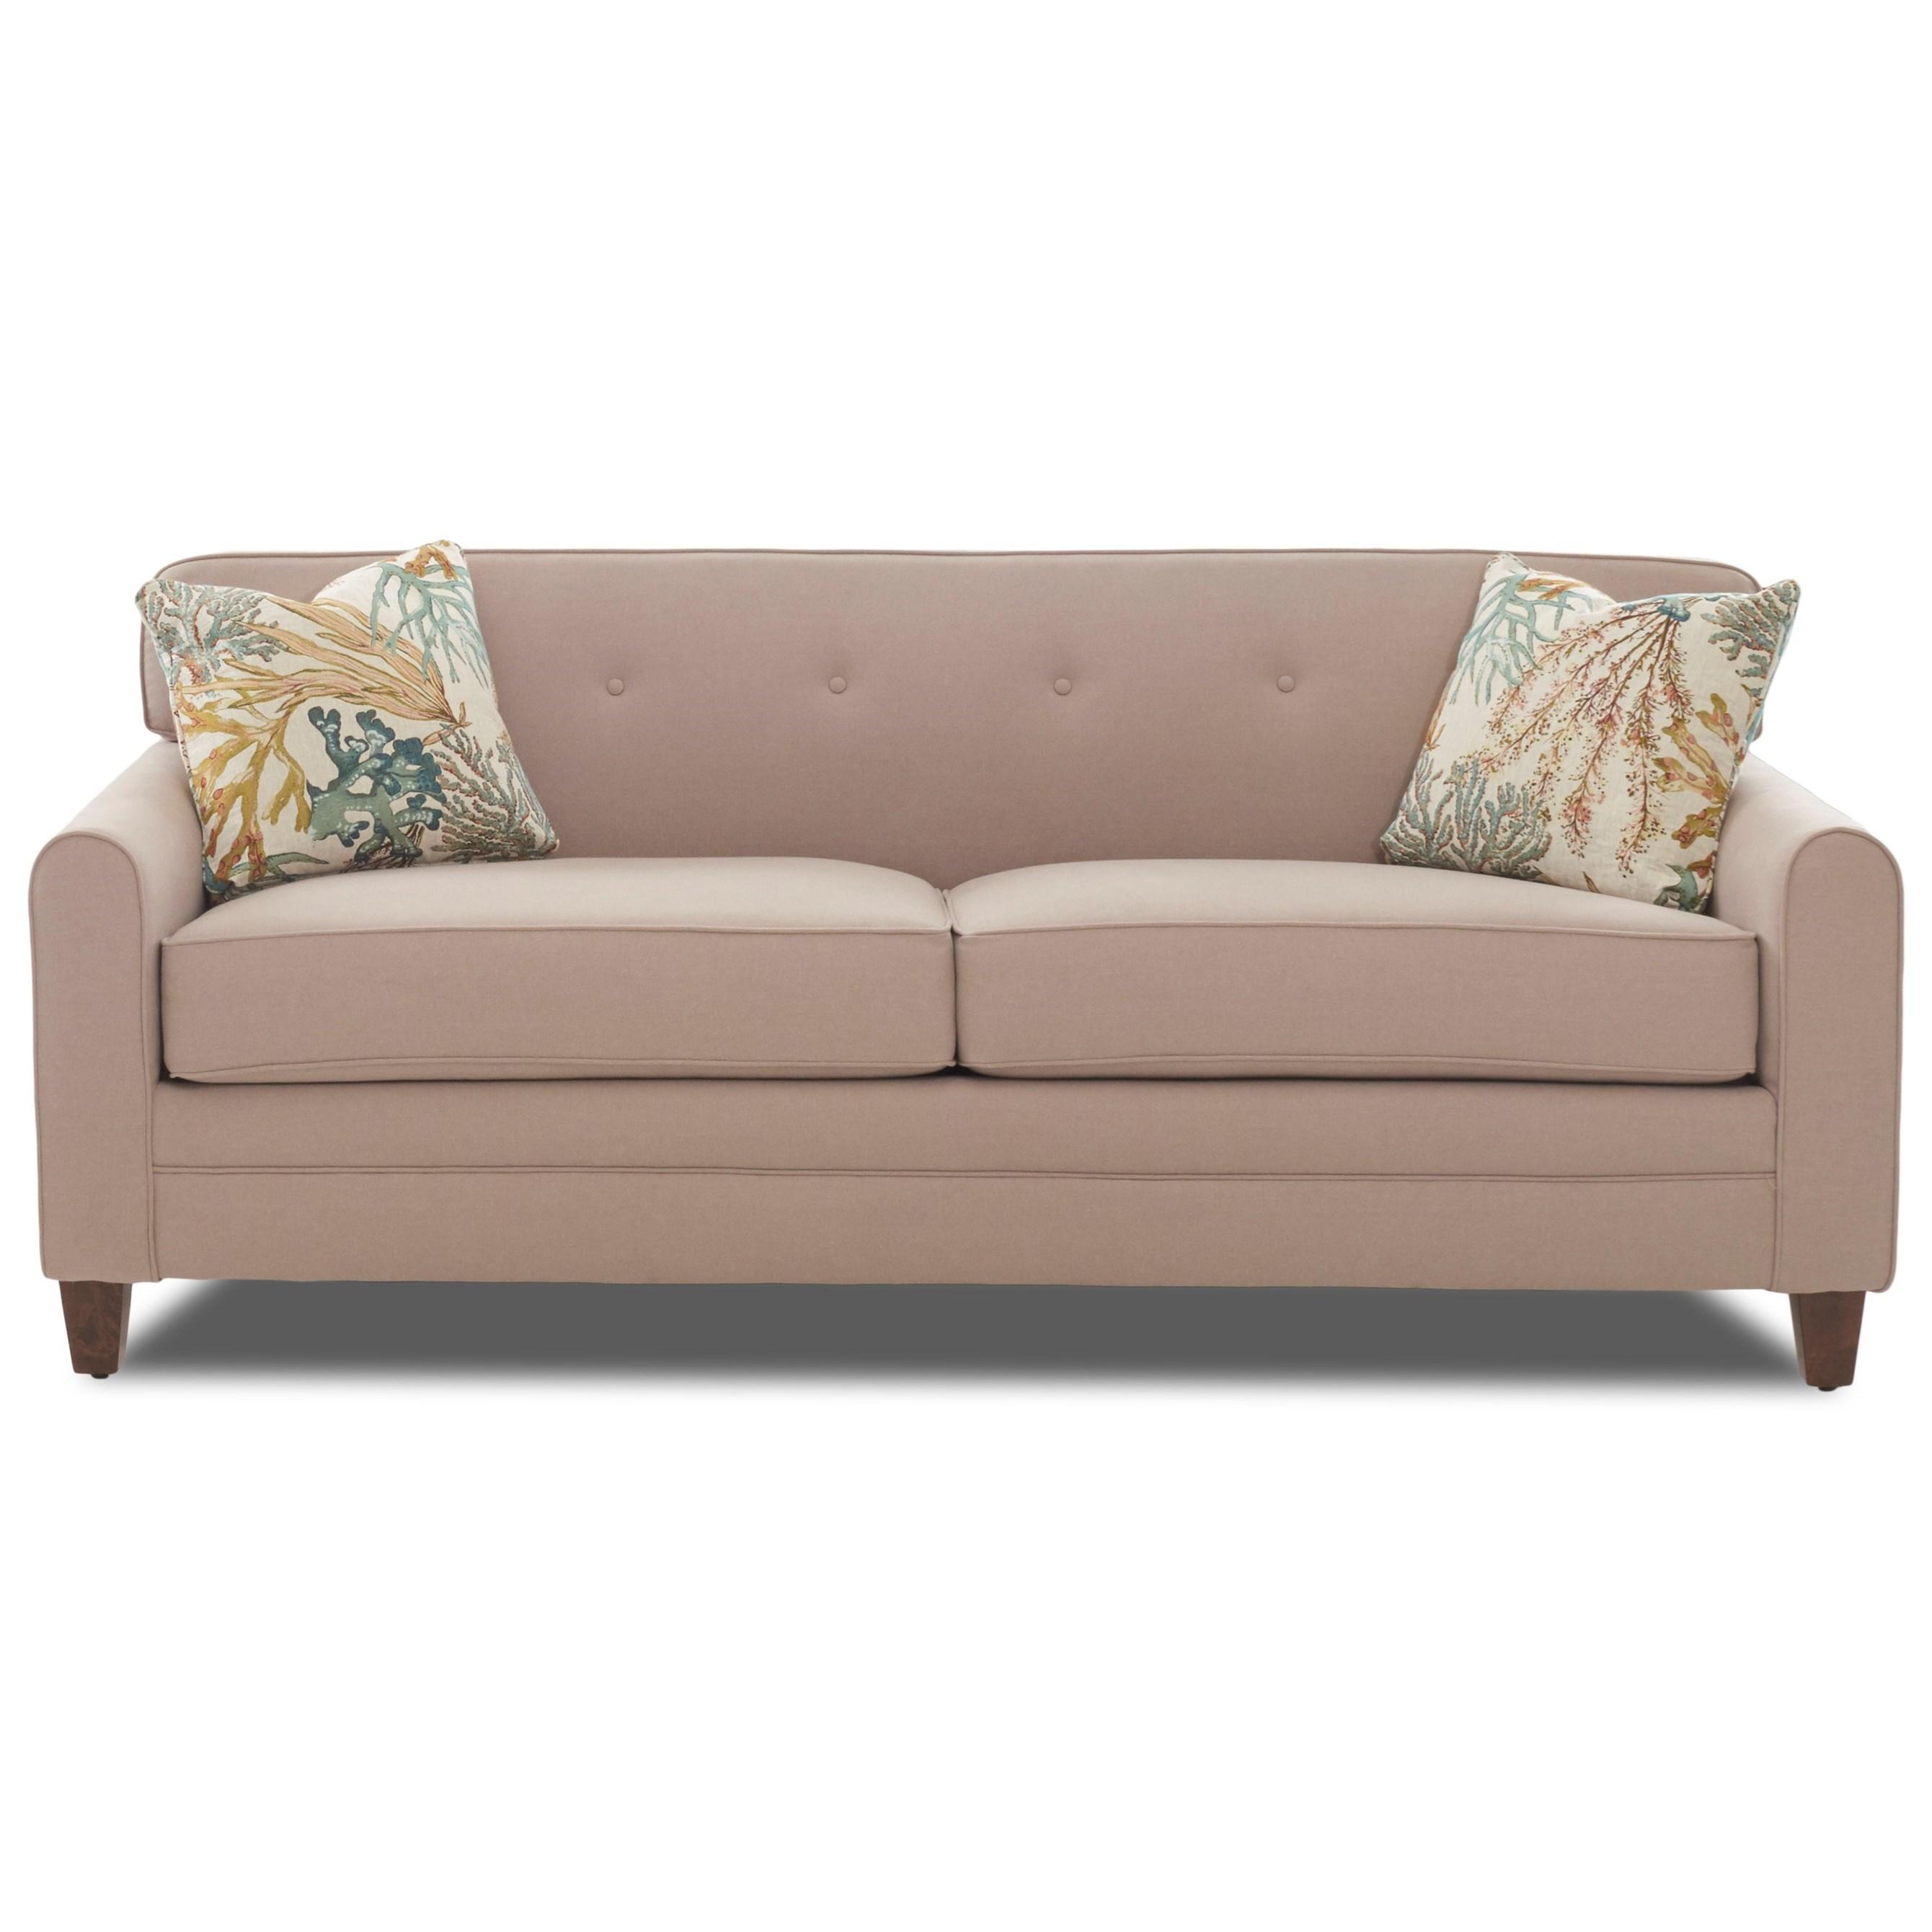 modern sleeper sofa bed mattress quick ship sofas furniture mid century with innerspring